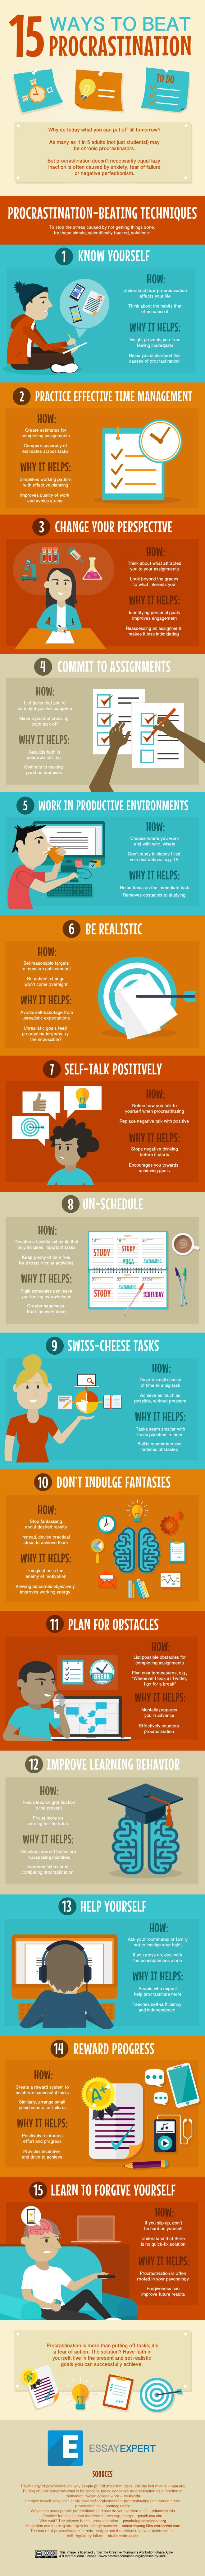 15-Ways-to-Beat-Procrastination-1.png